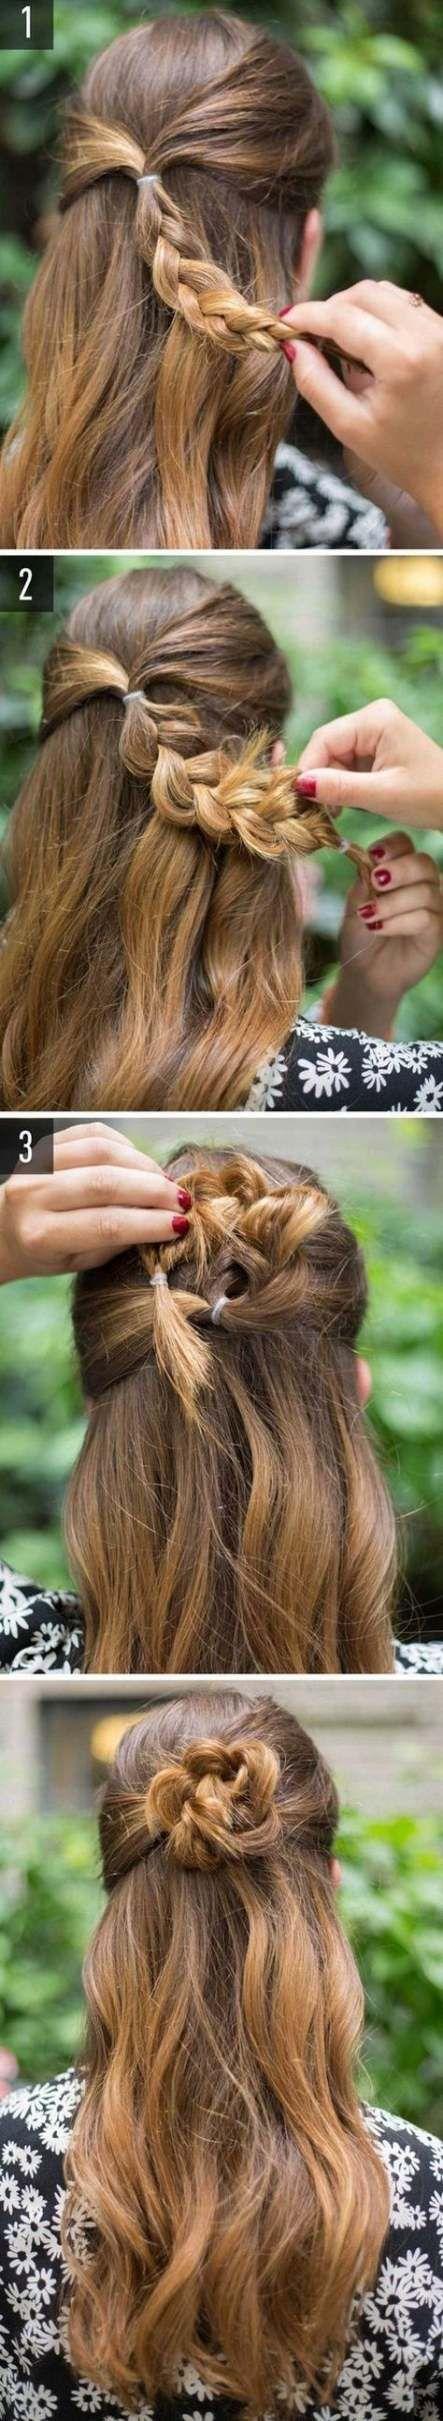 62 Trendy Hairstyles Wavy Wedding For Women